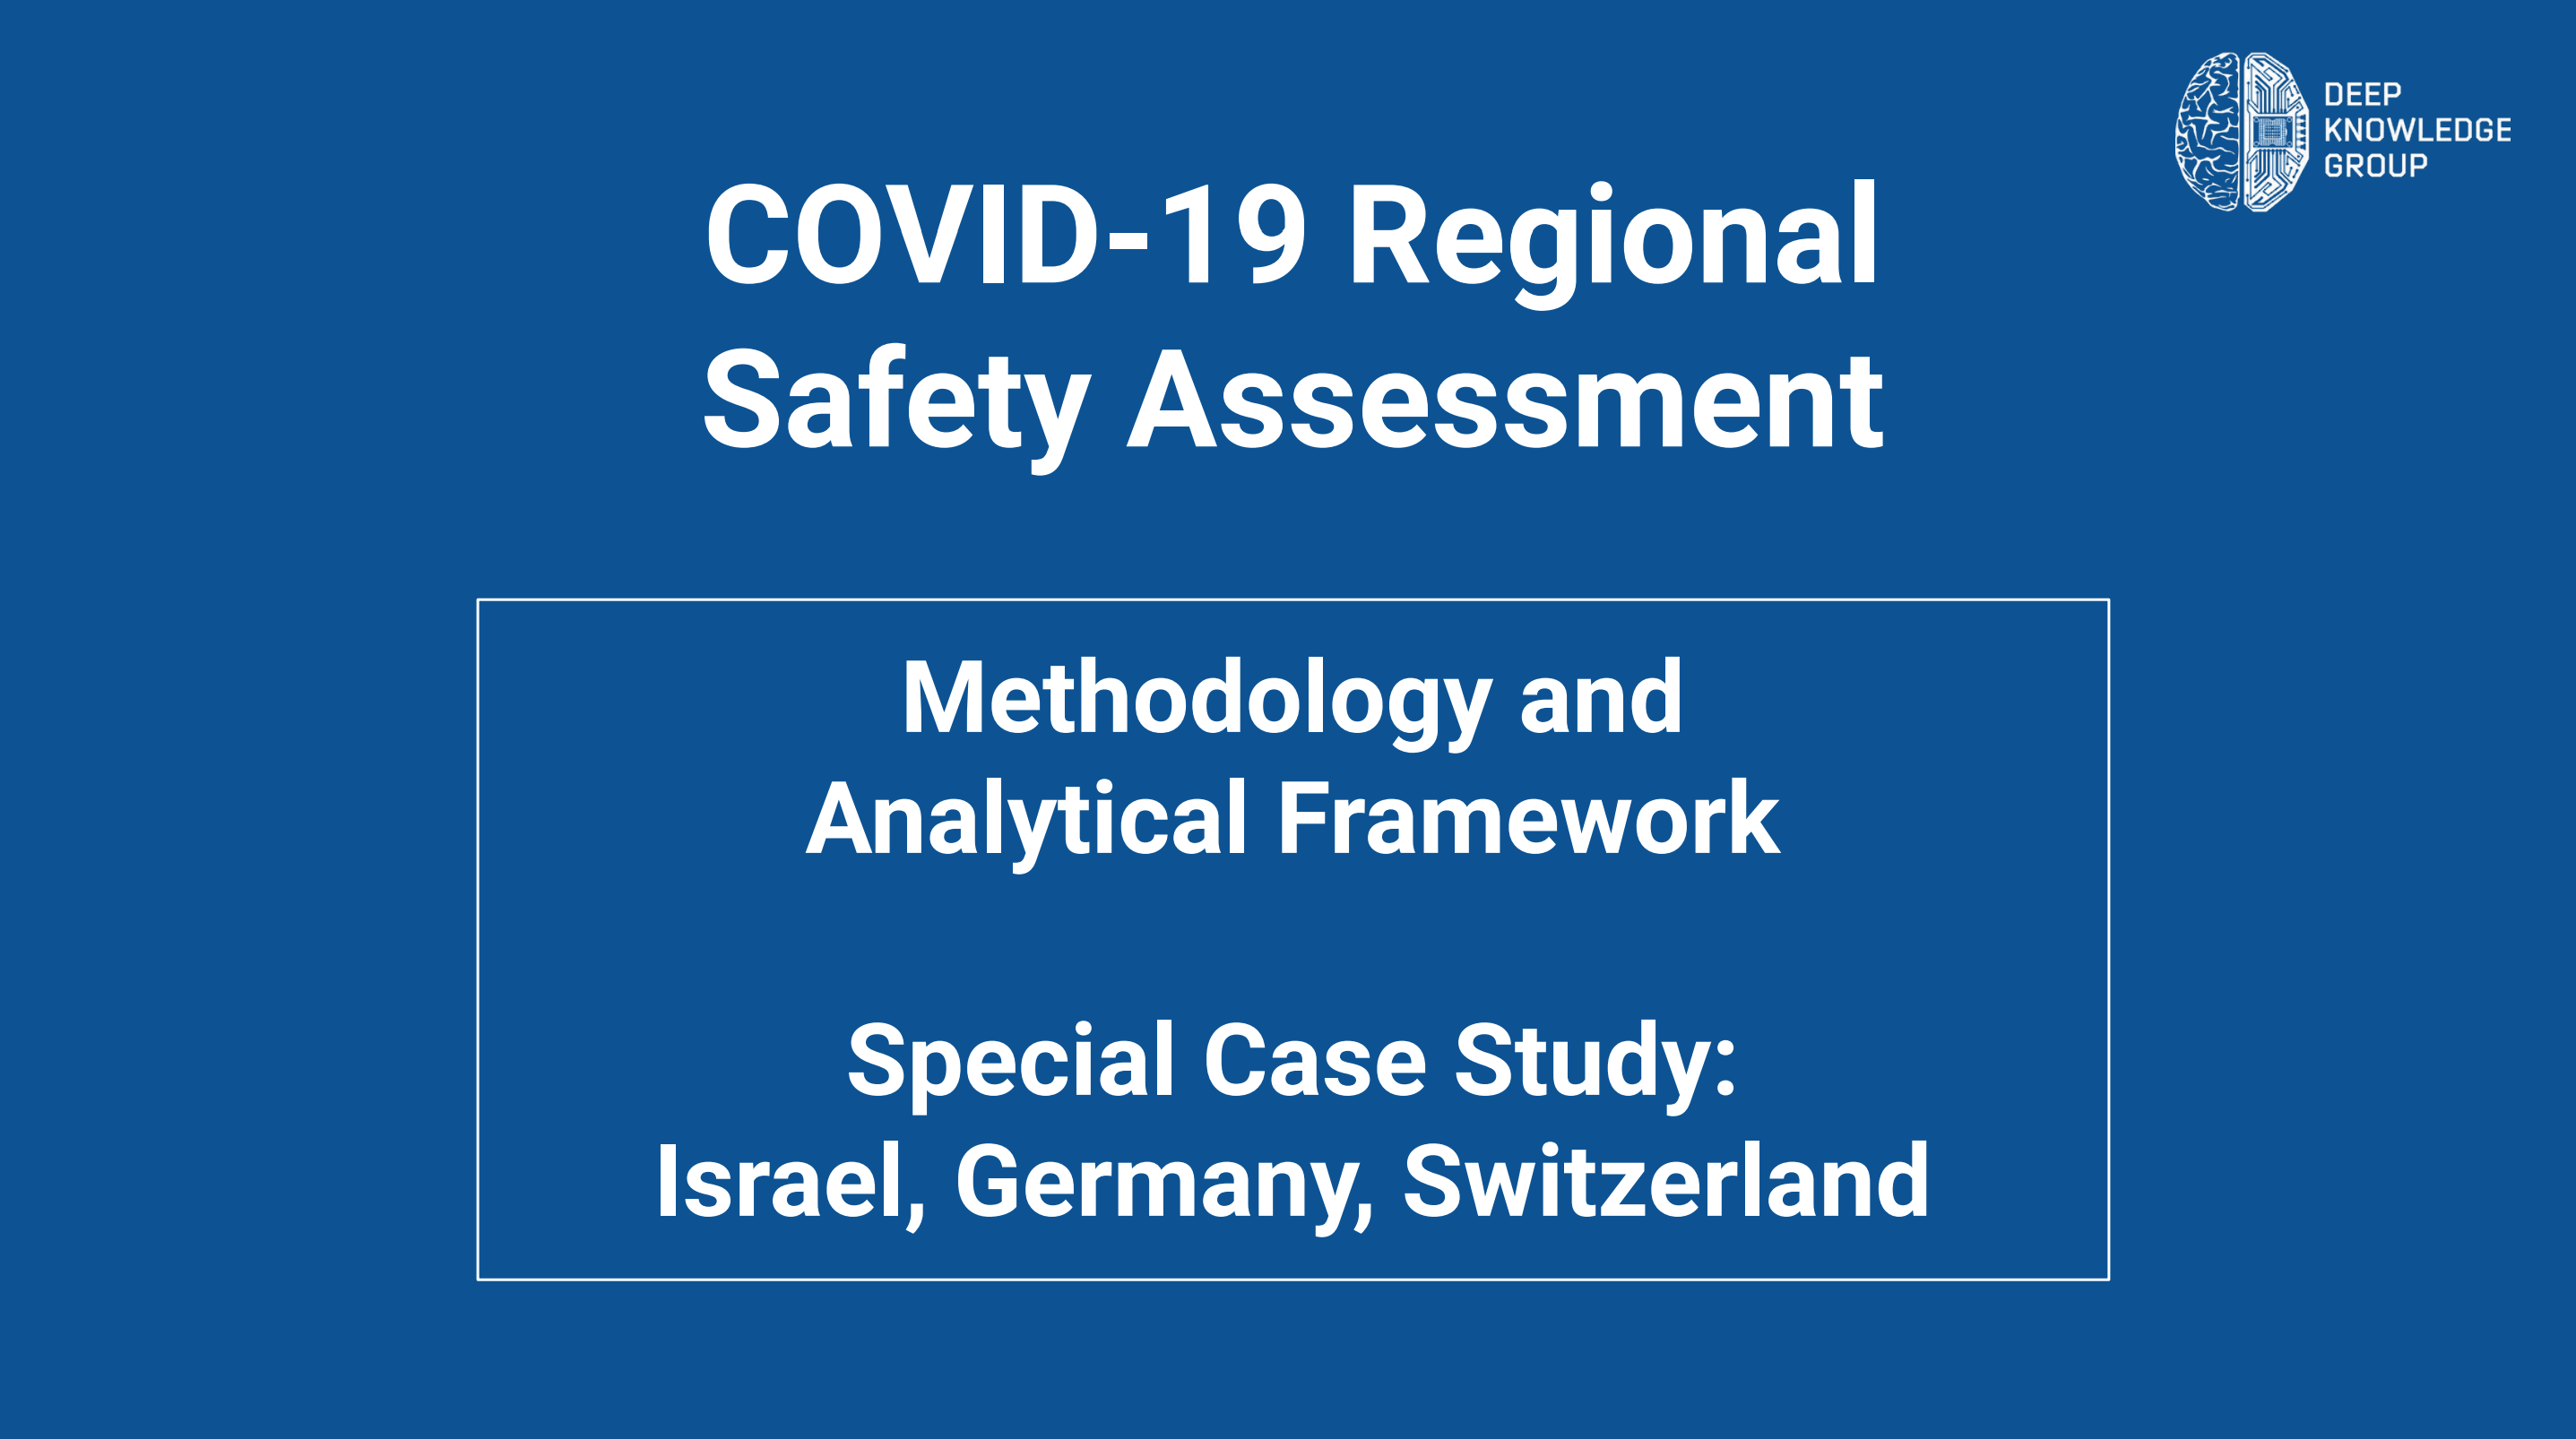 COVID-19 Regional Safety Assessment | DKG